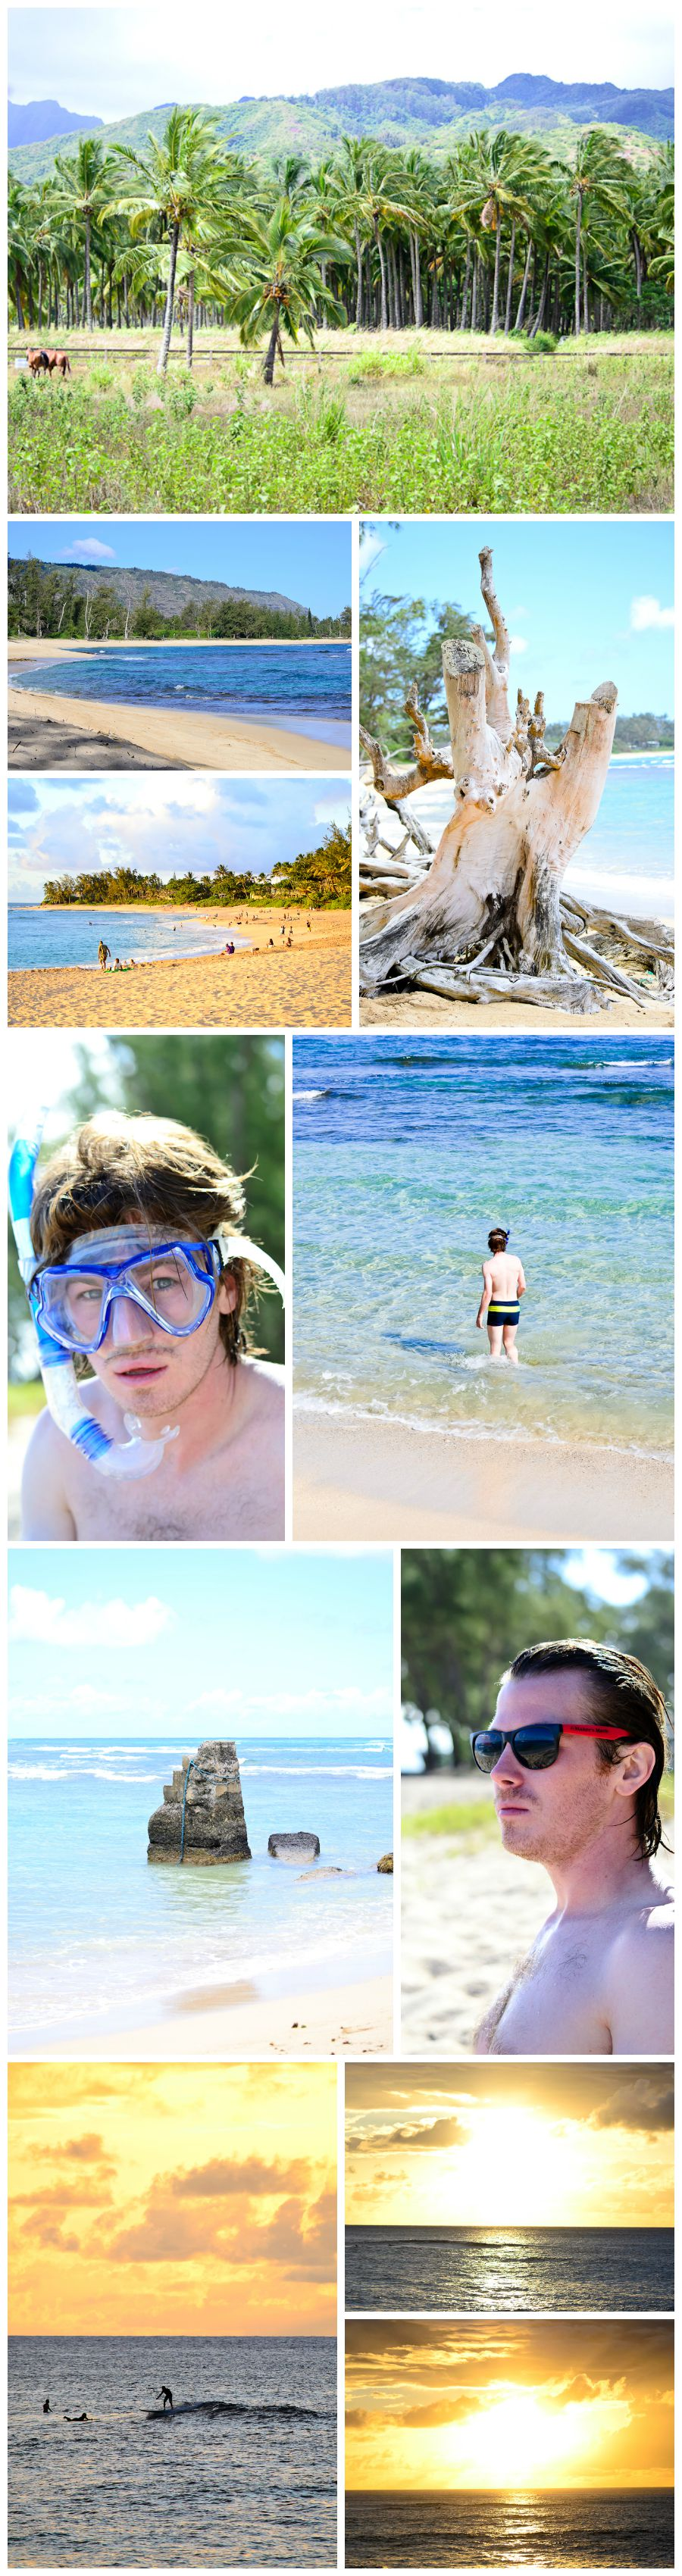 Hawaii Collage 6c